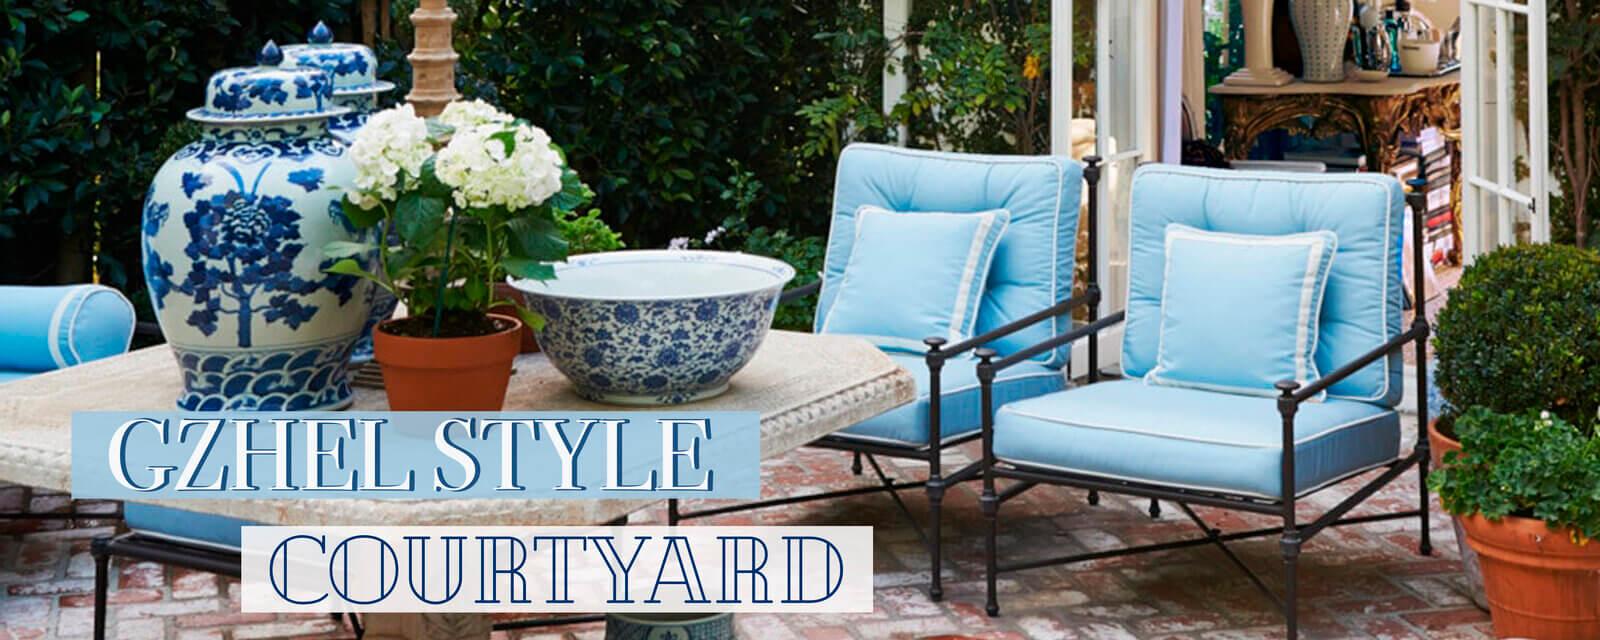 Gzhel Style | Courtyard